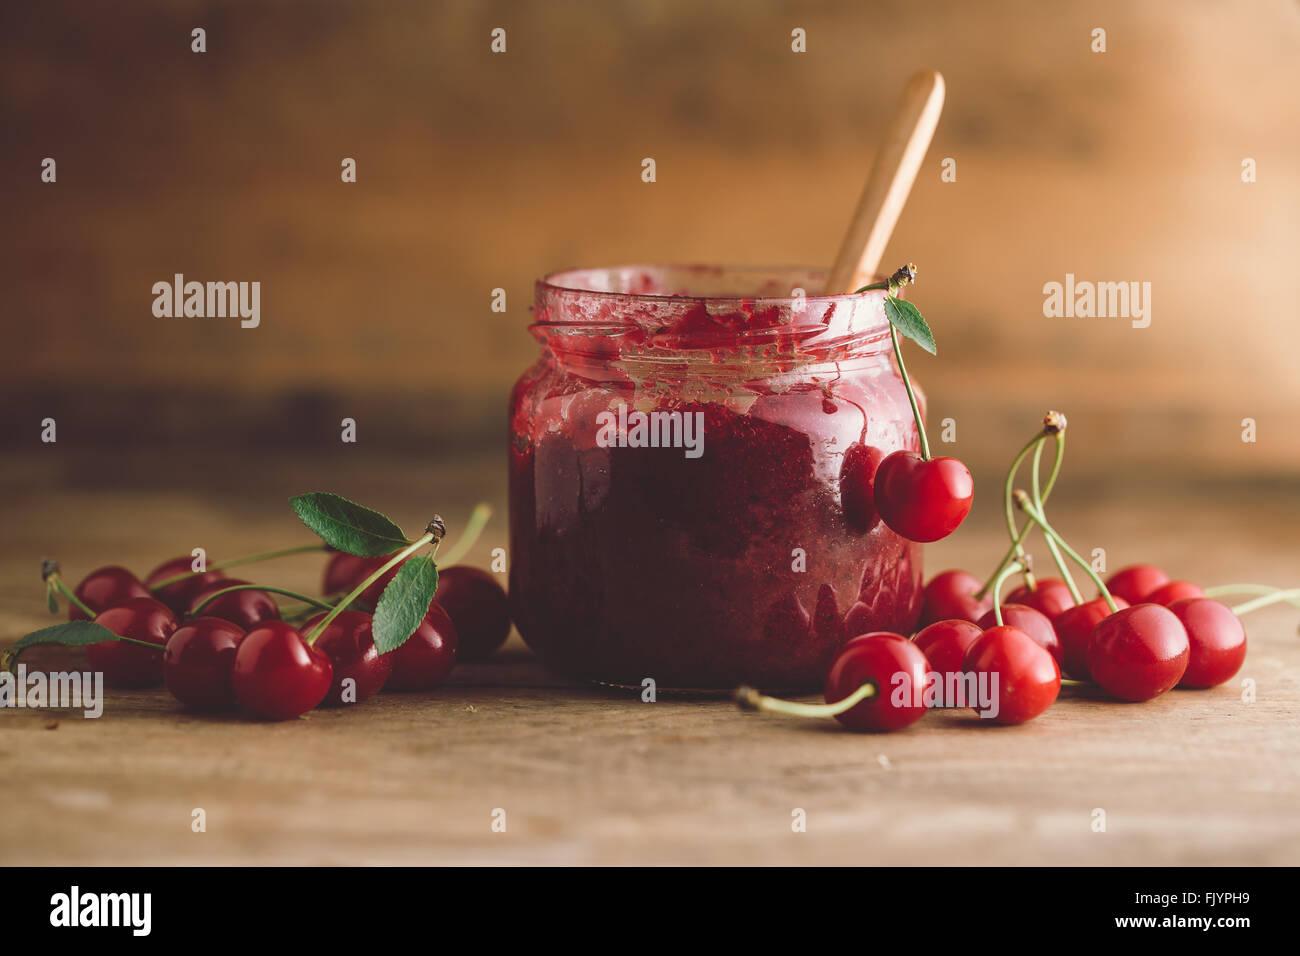 Jar of cherry jam, sour cherries and spoon - Stock Image